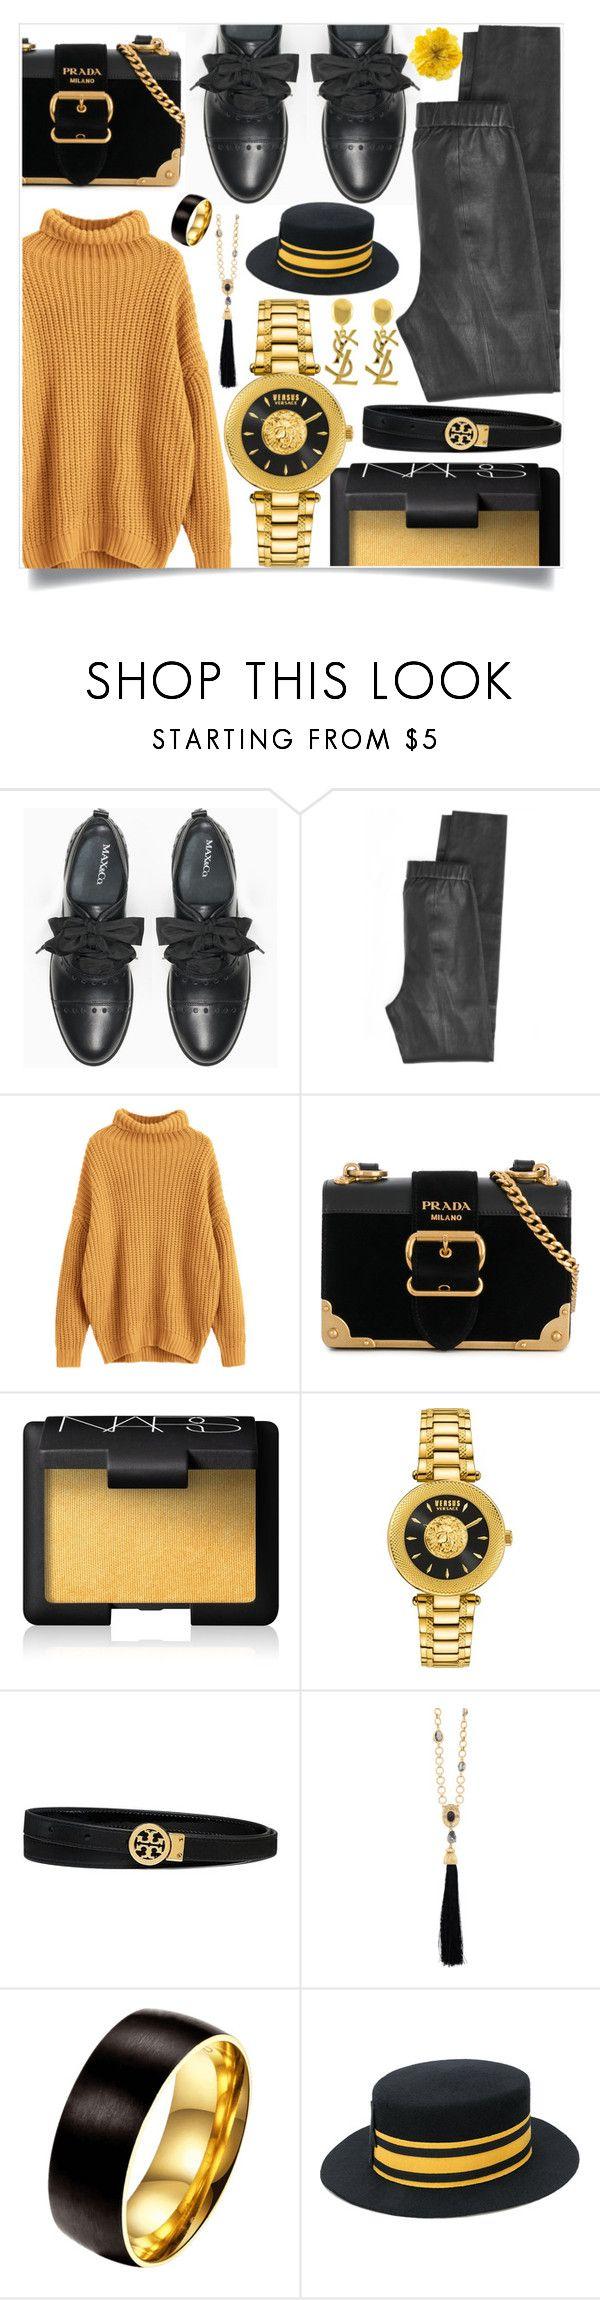 """yellow & black."" by ezgi-g ❤ liked on Polyvore featuring Max&Co., Calypso St. Barth, Prada, NARS Cosmetics, Versus, Tory Burch, Yves Saint Laurent, Oscar de la Renta, Le Chapeau by Alakazia and Gucci"